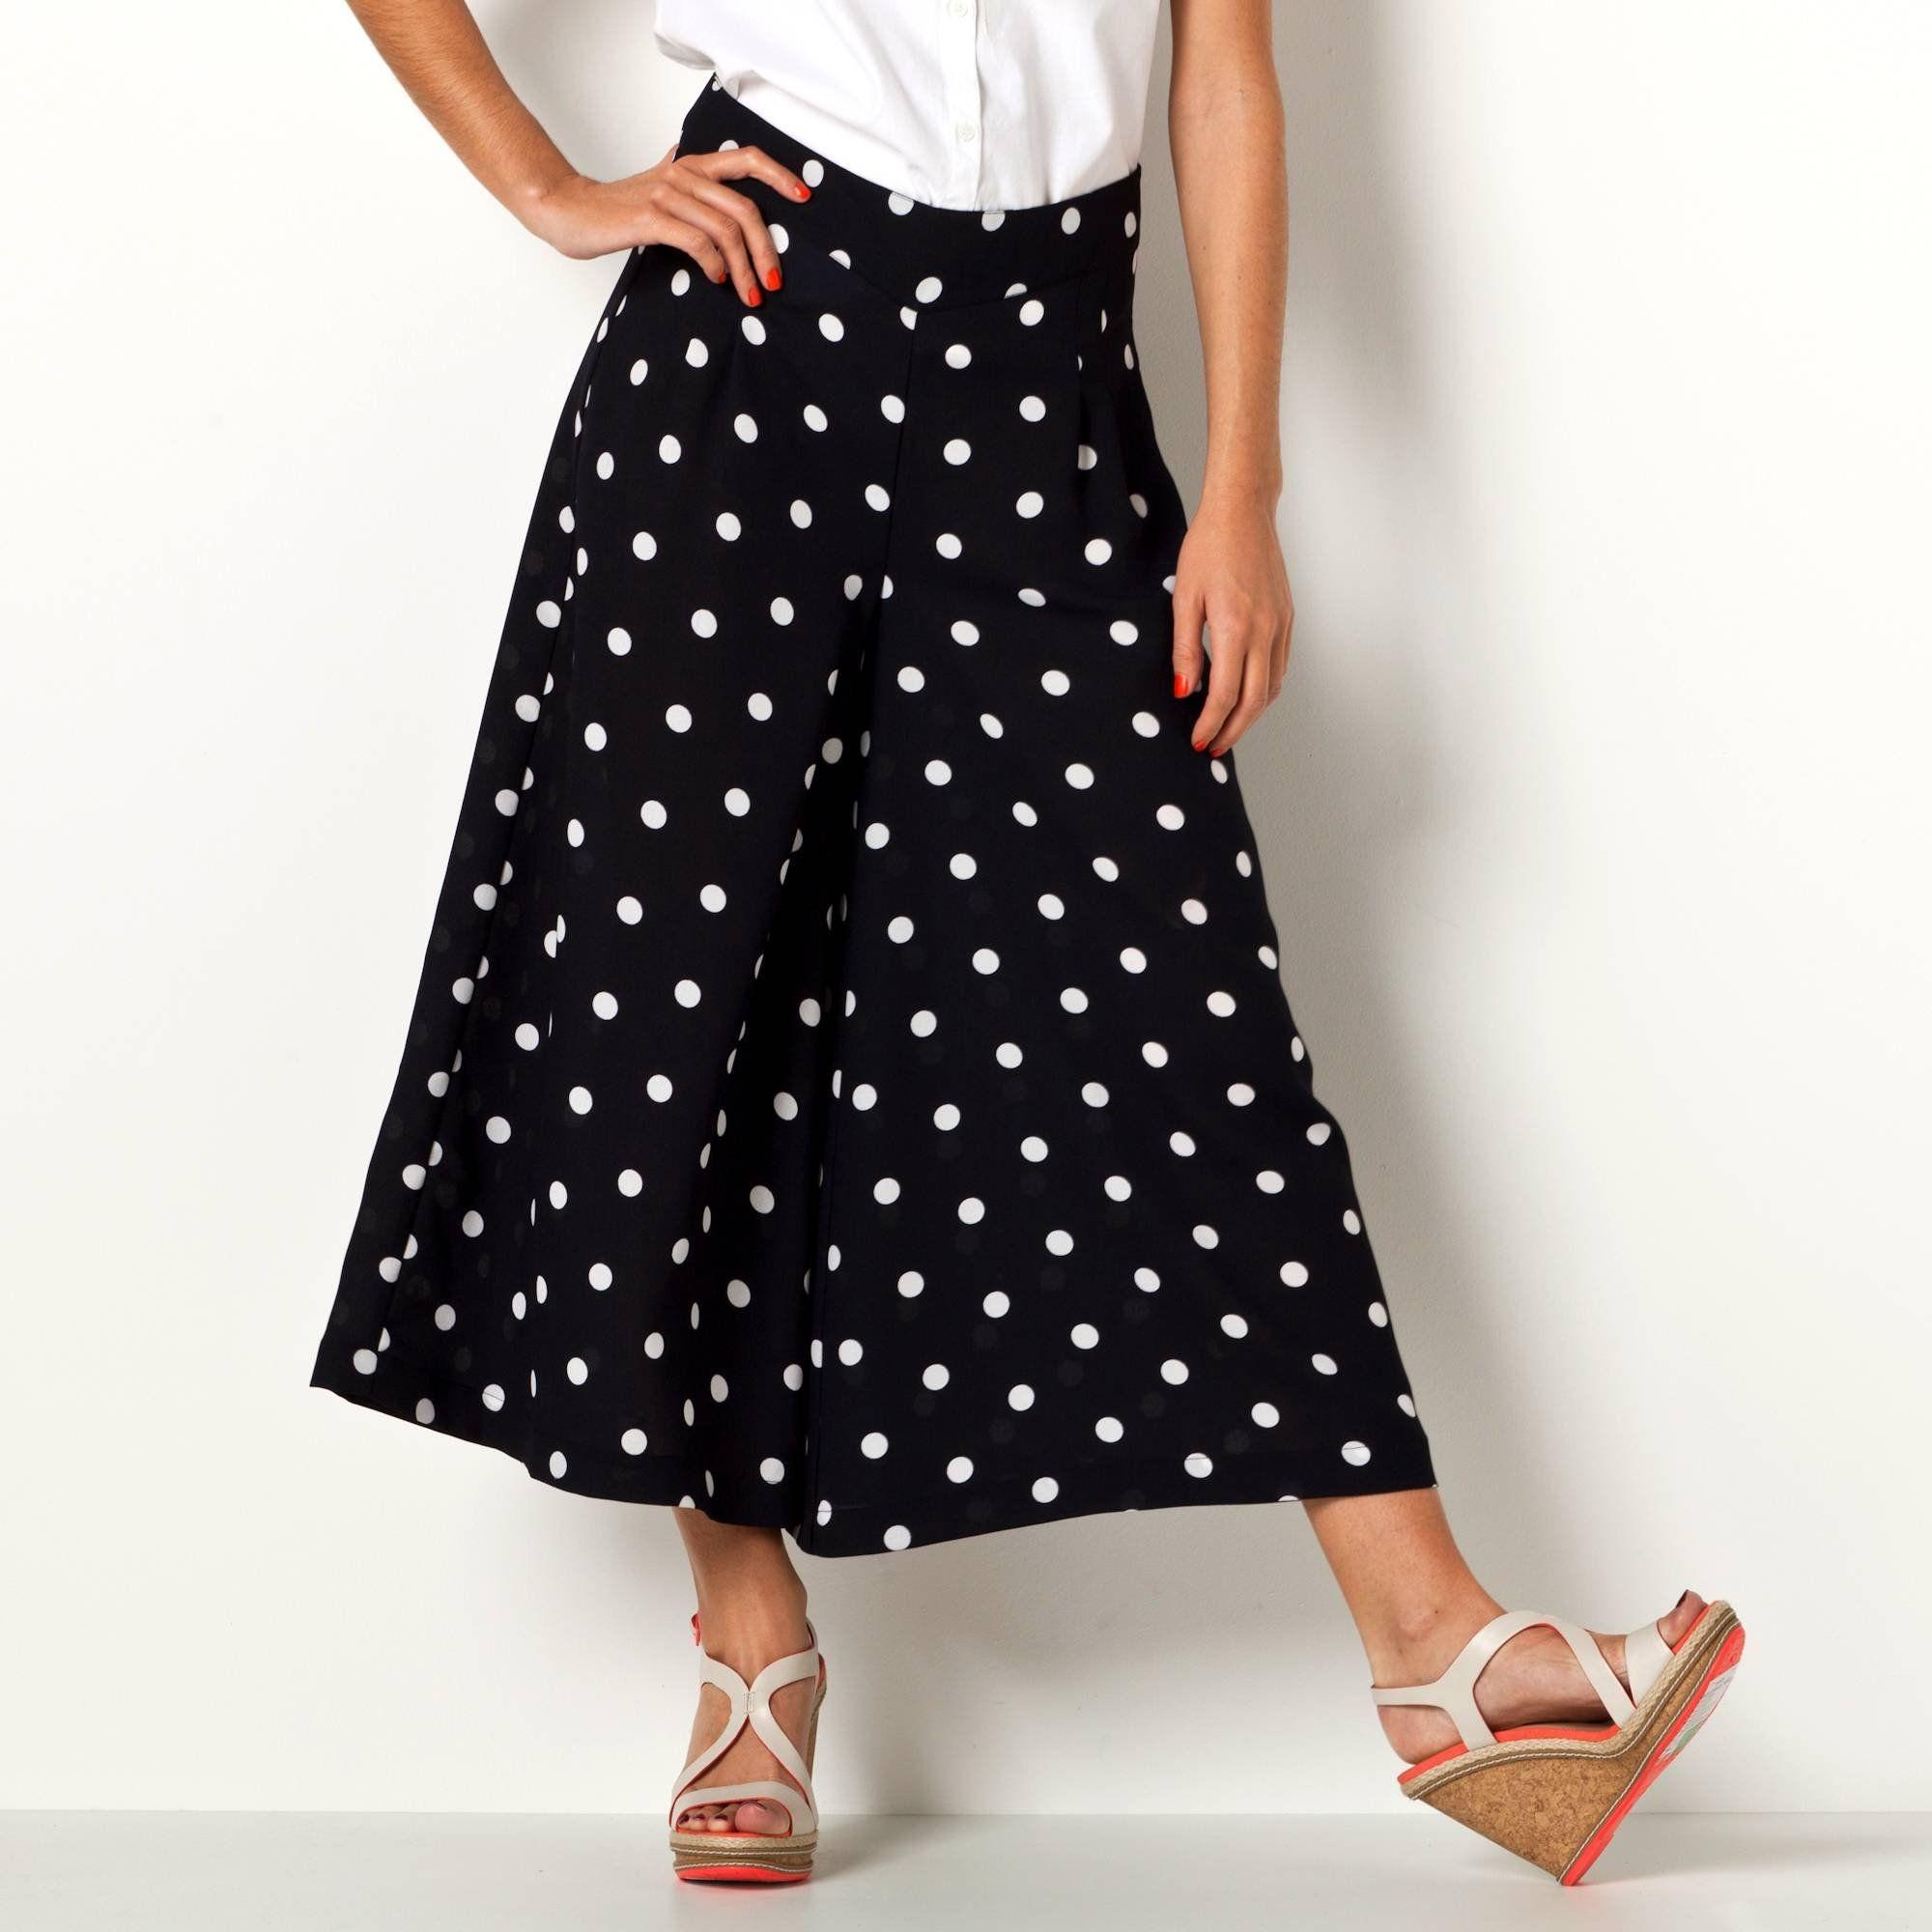 jupe culotte fluide imprim e extra large femme jupe culotte pantalon fluide et pantalons. Black Bedroom Furniture Sets. Home Design Ideas